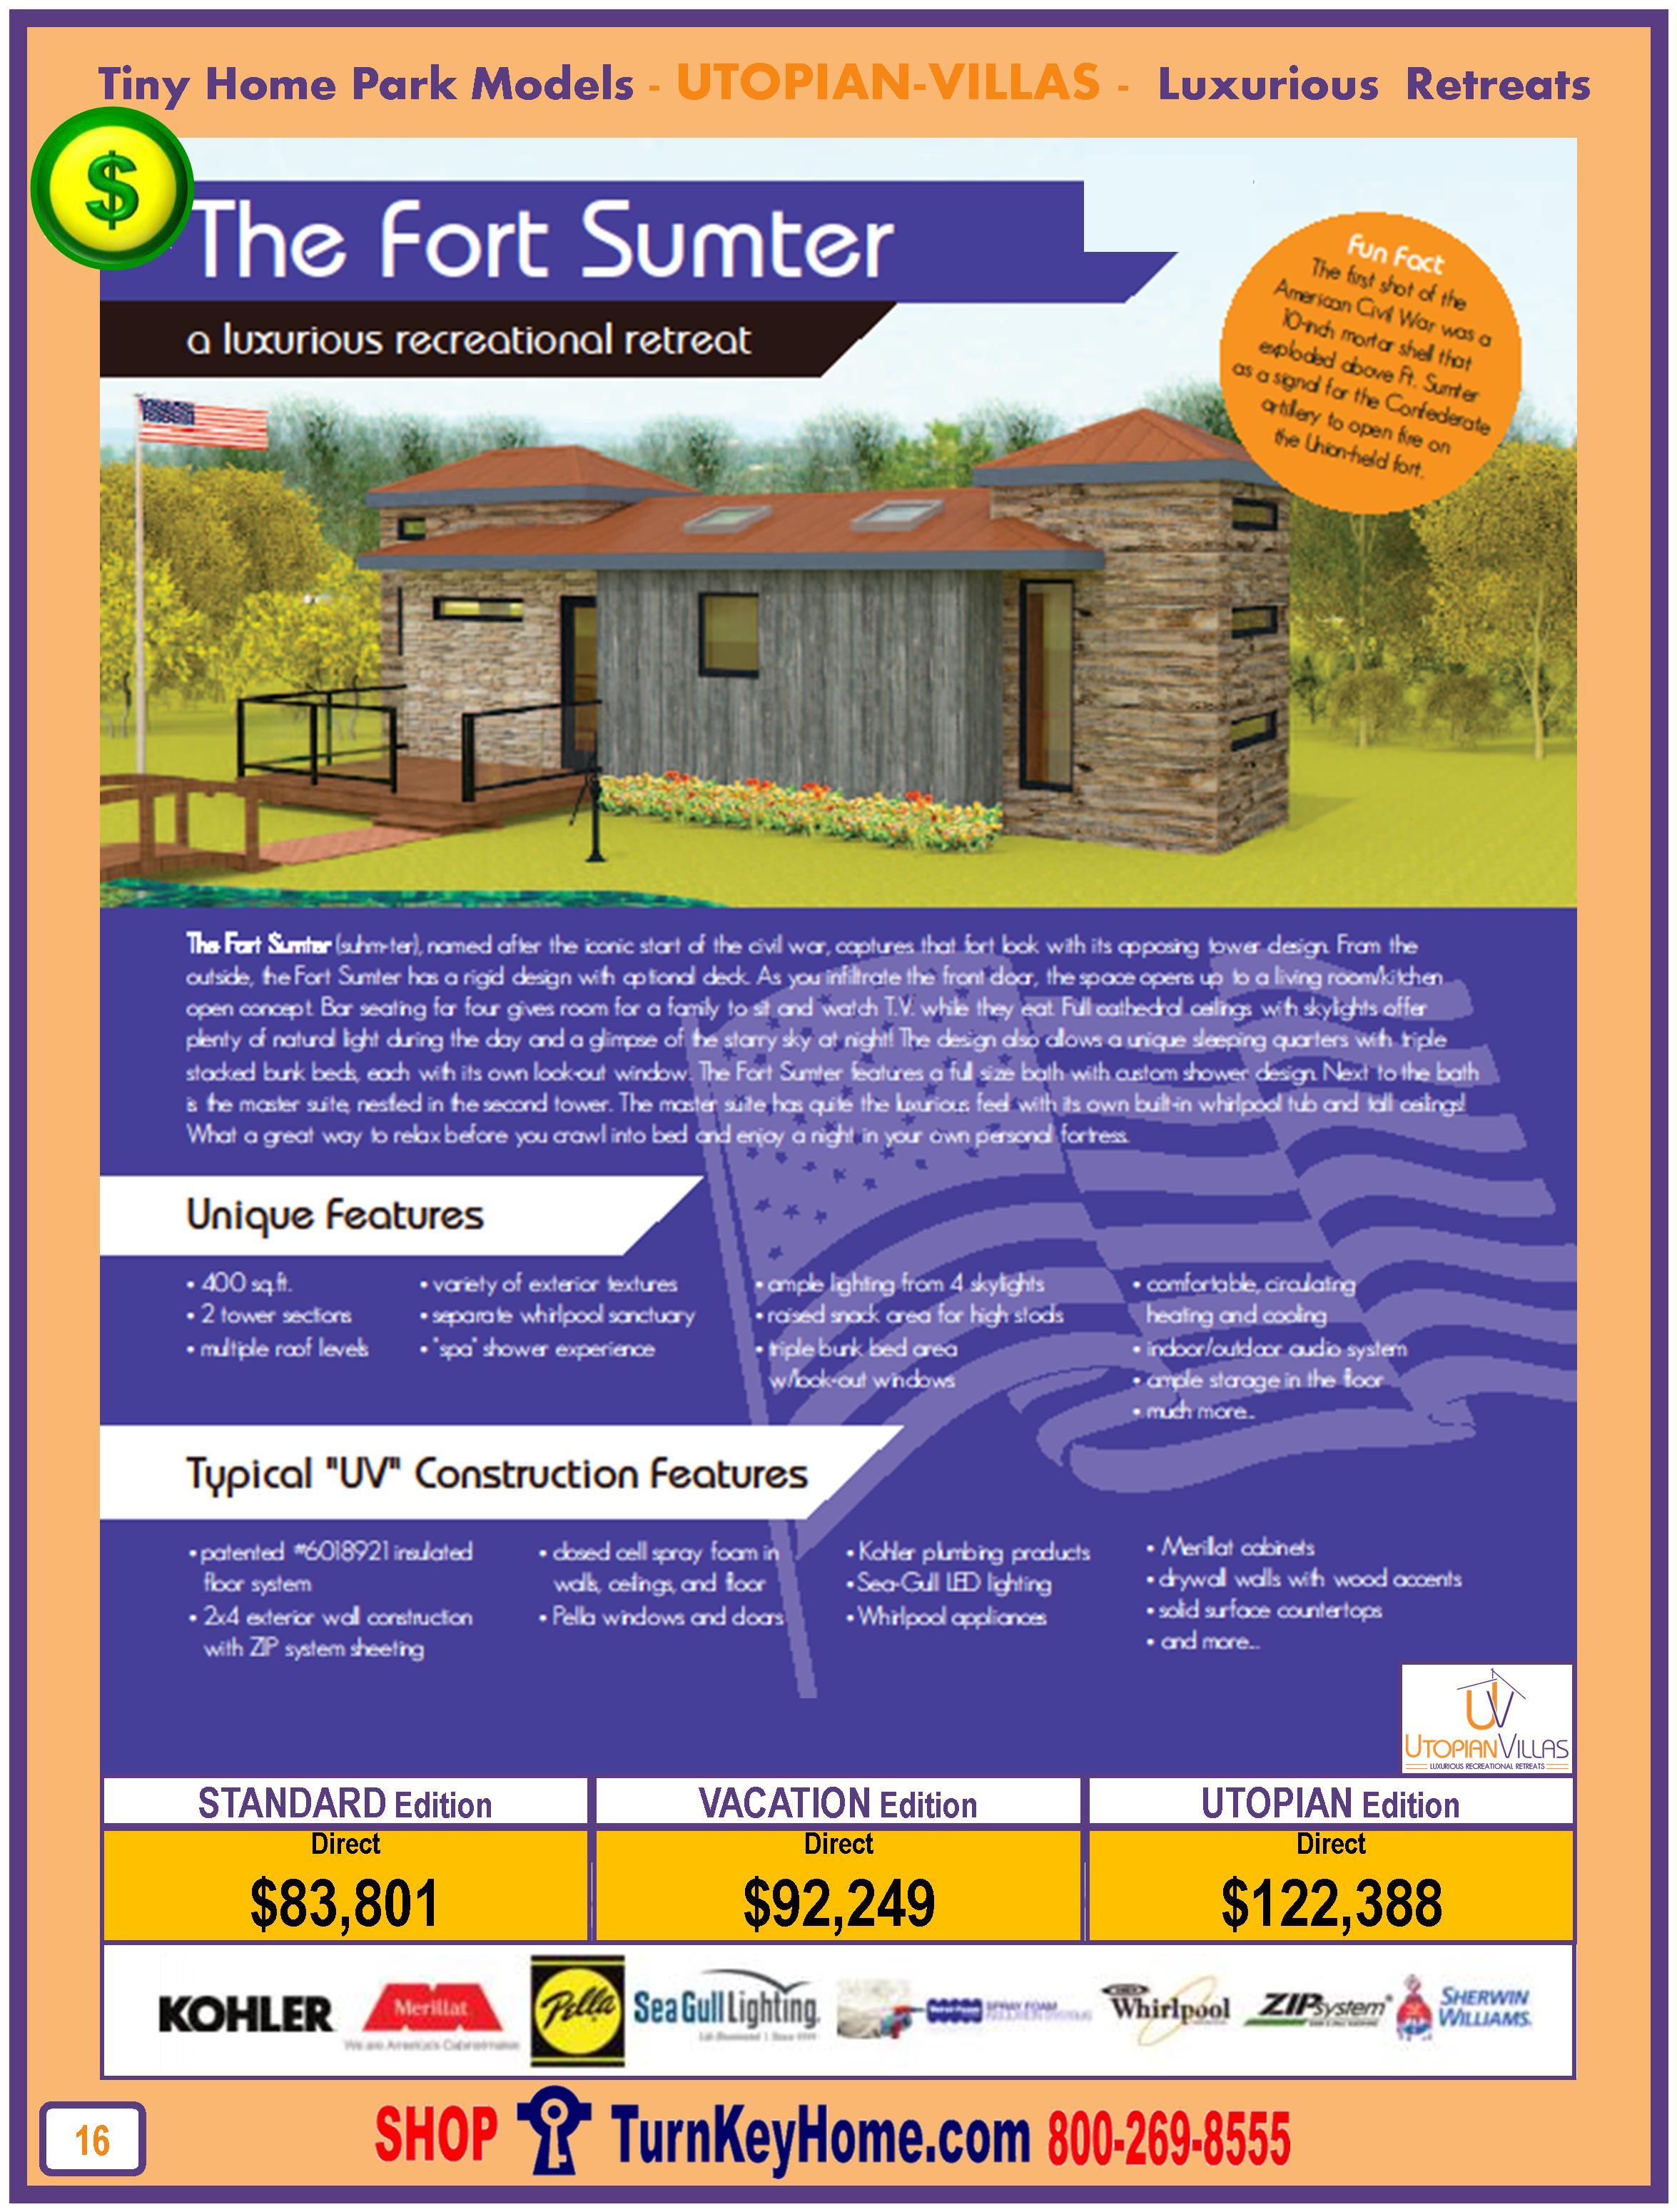 Tiny.Home.Park.Model.Utopian.Villas.FORT.SUMTER.Plan.Price.P16.0116